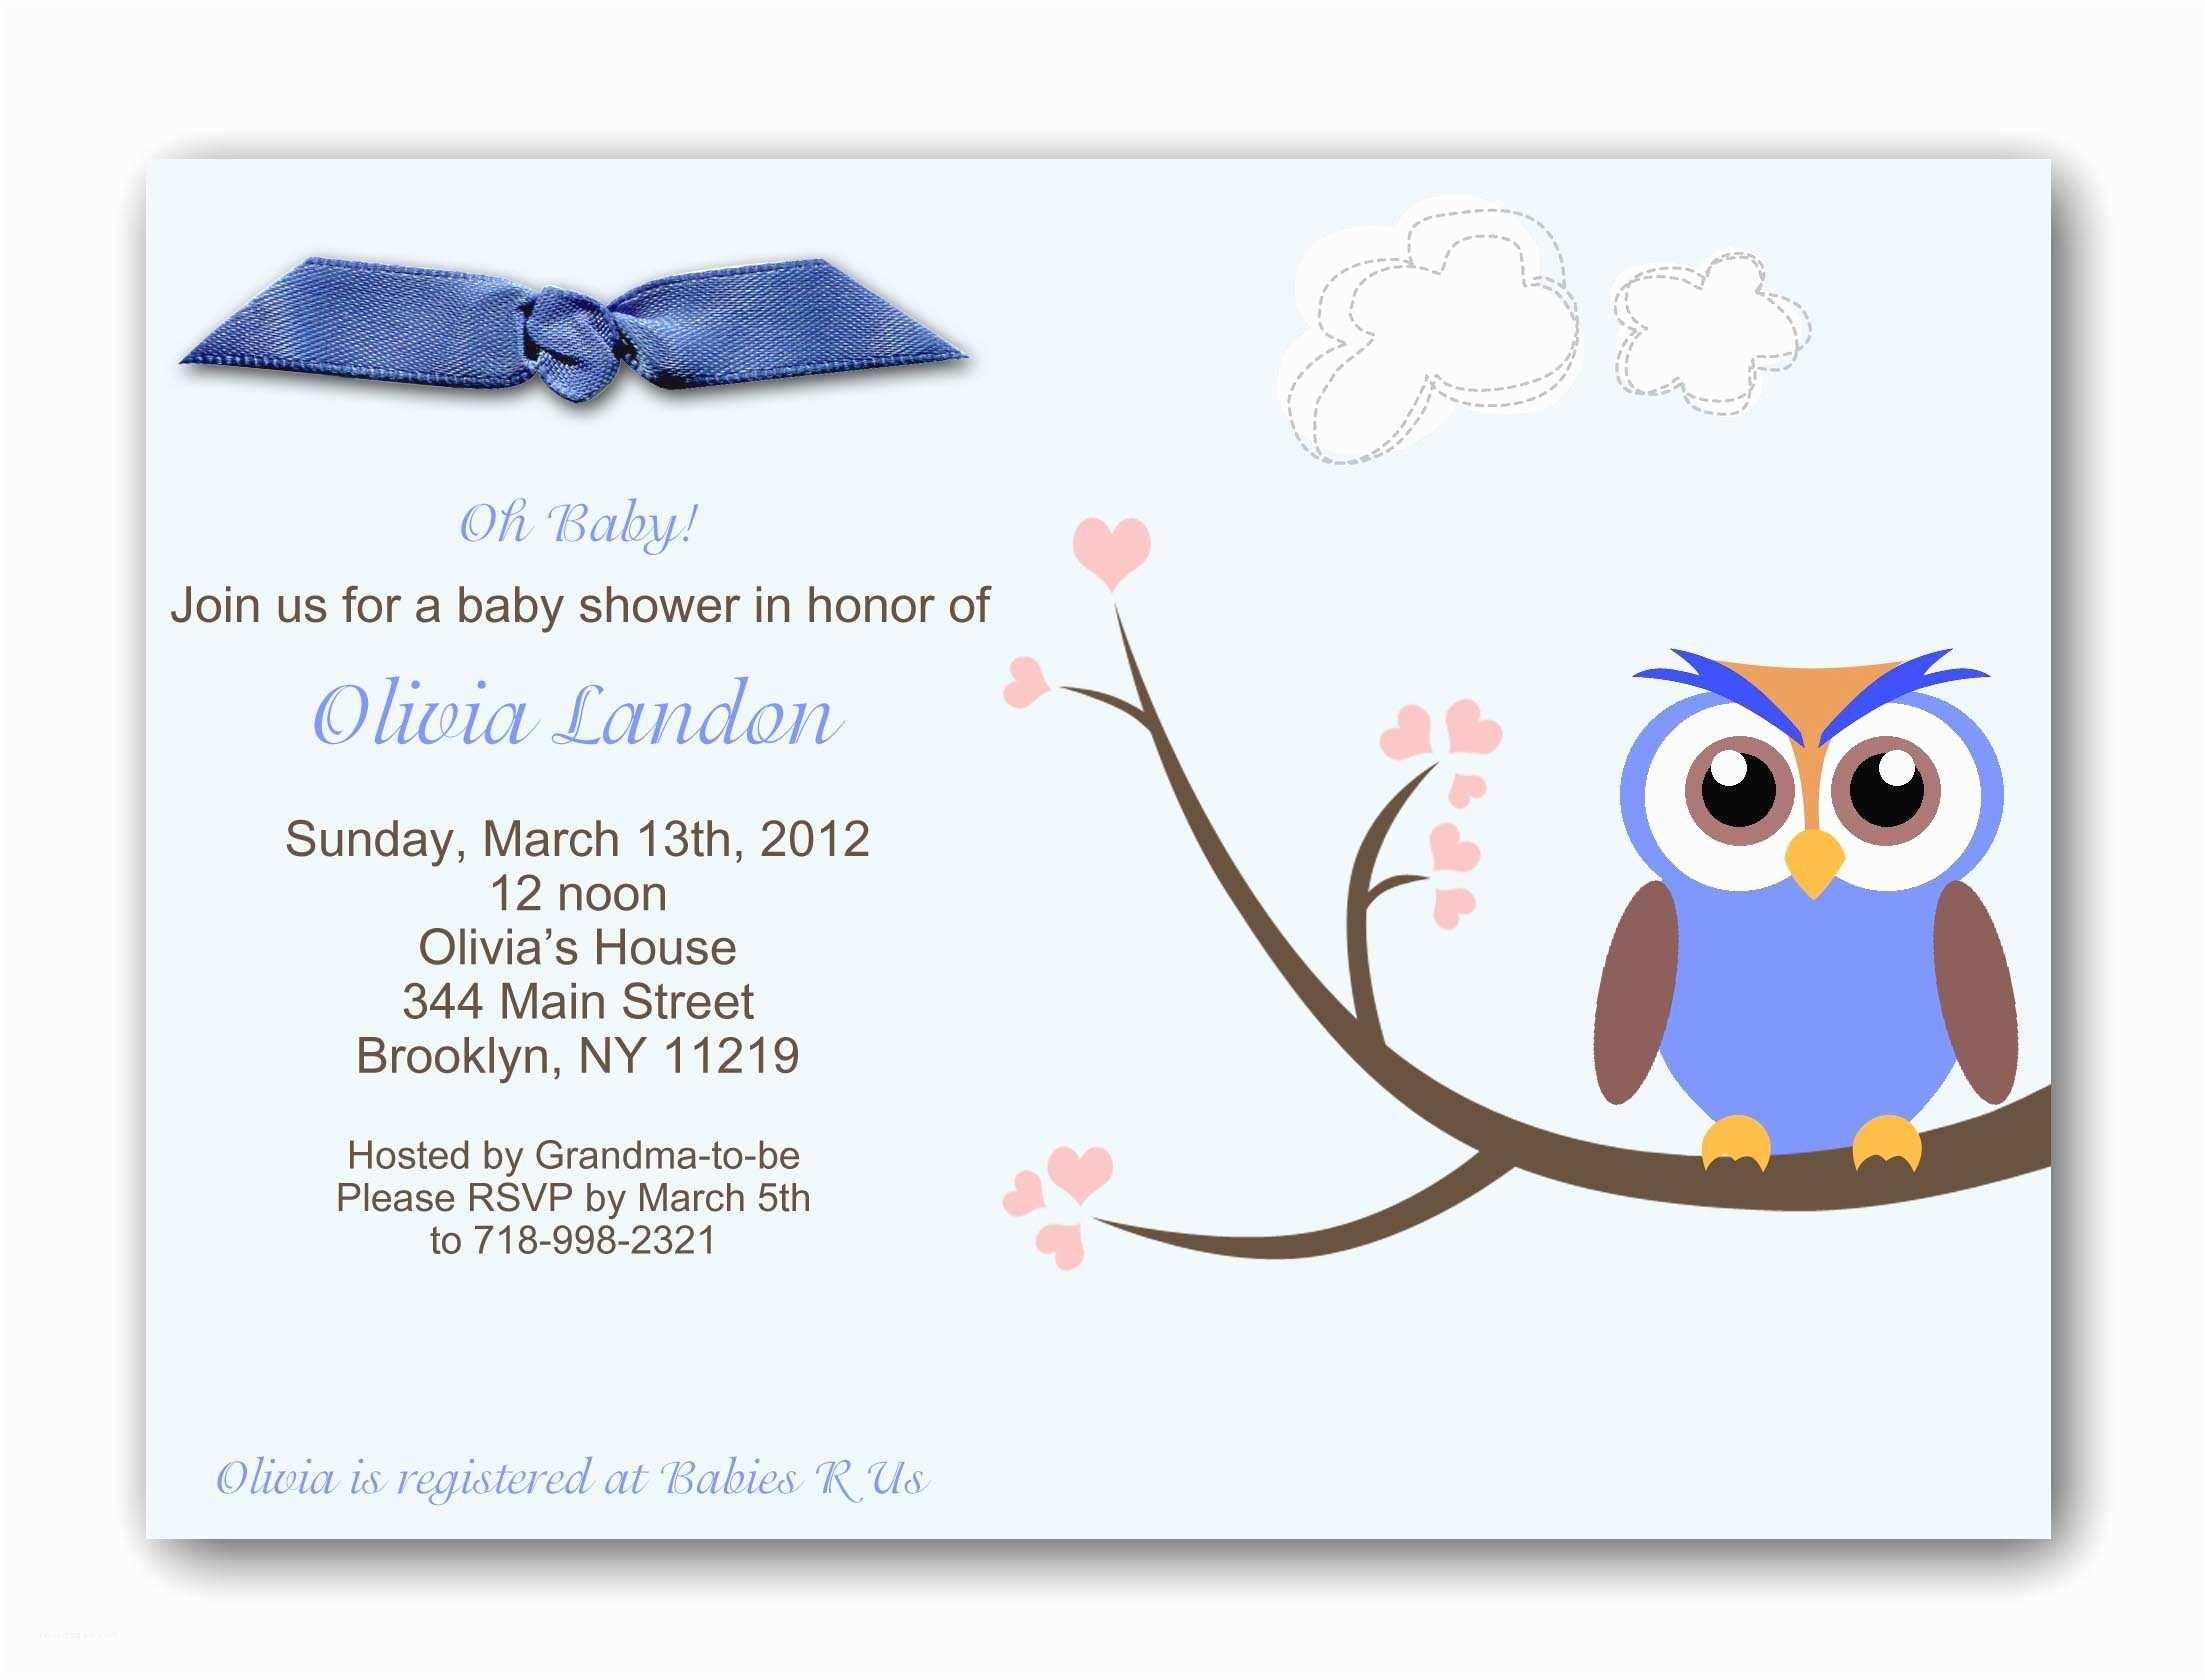 Baby Boy Shower Invitation Wording Baby Shower Invitations for Boys